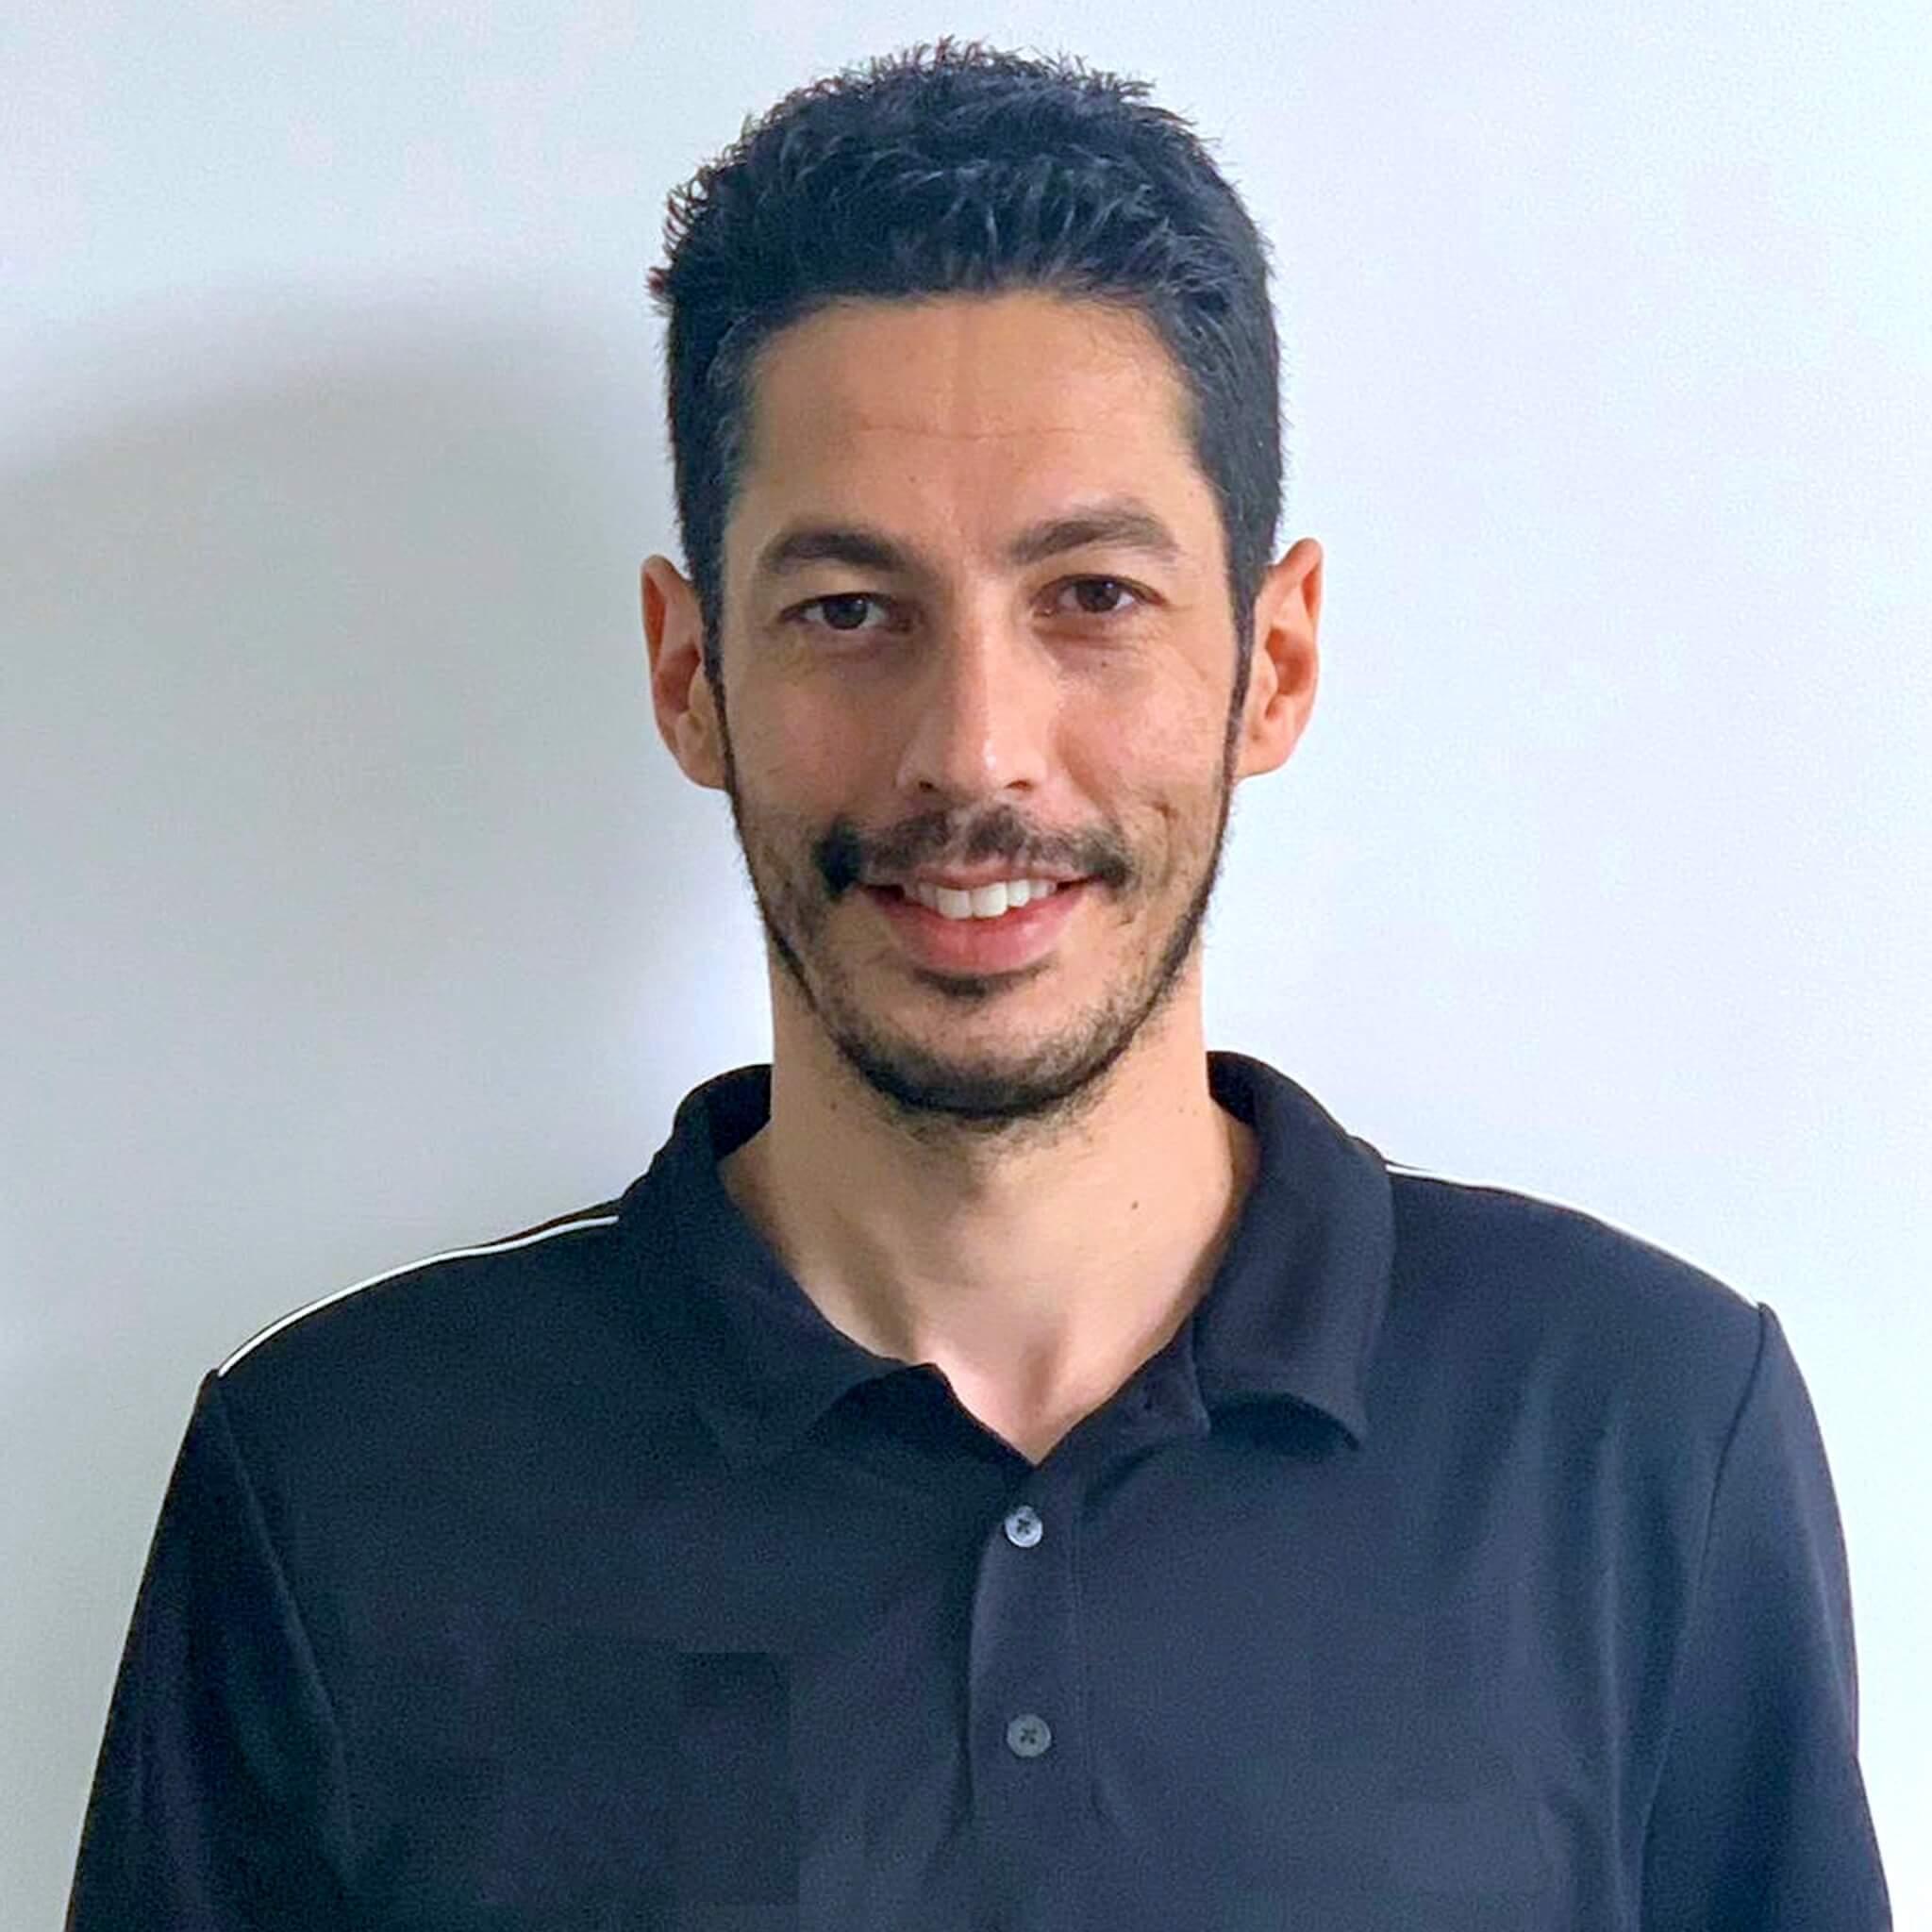 Paulo Jorge Sá Ferreira